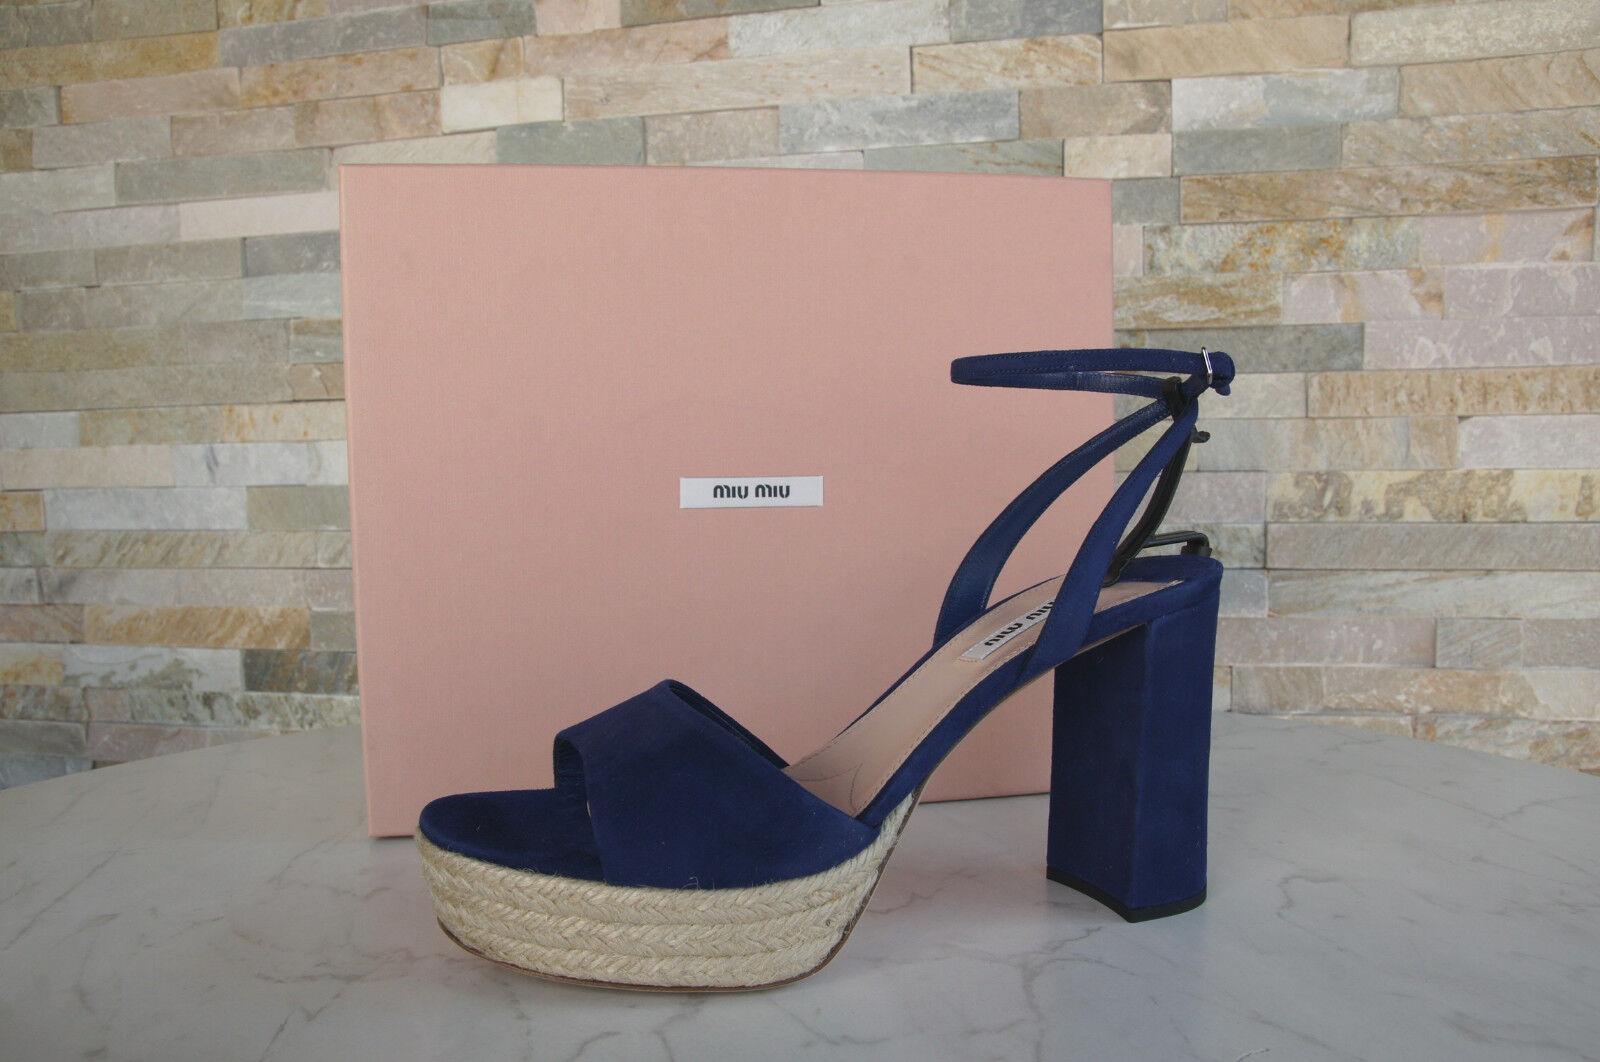 Miu Miu plataforma sandalias zapatos sandals cáñamo azul navy nuevo PVP